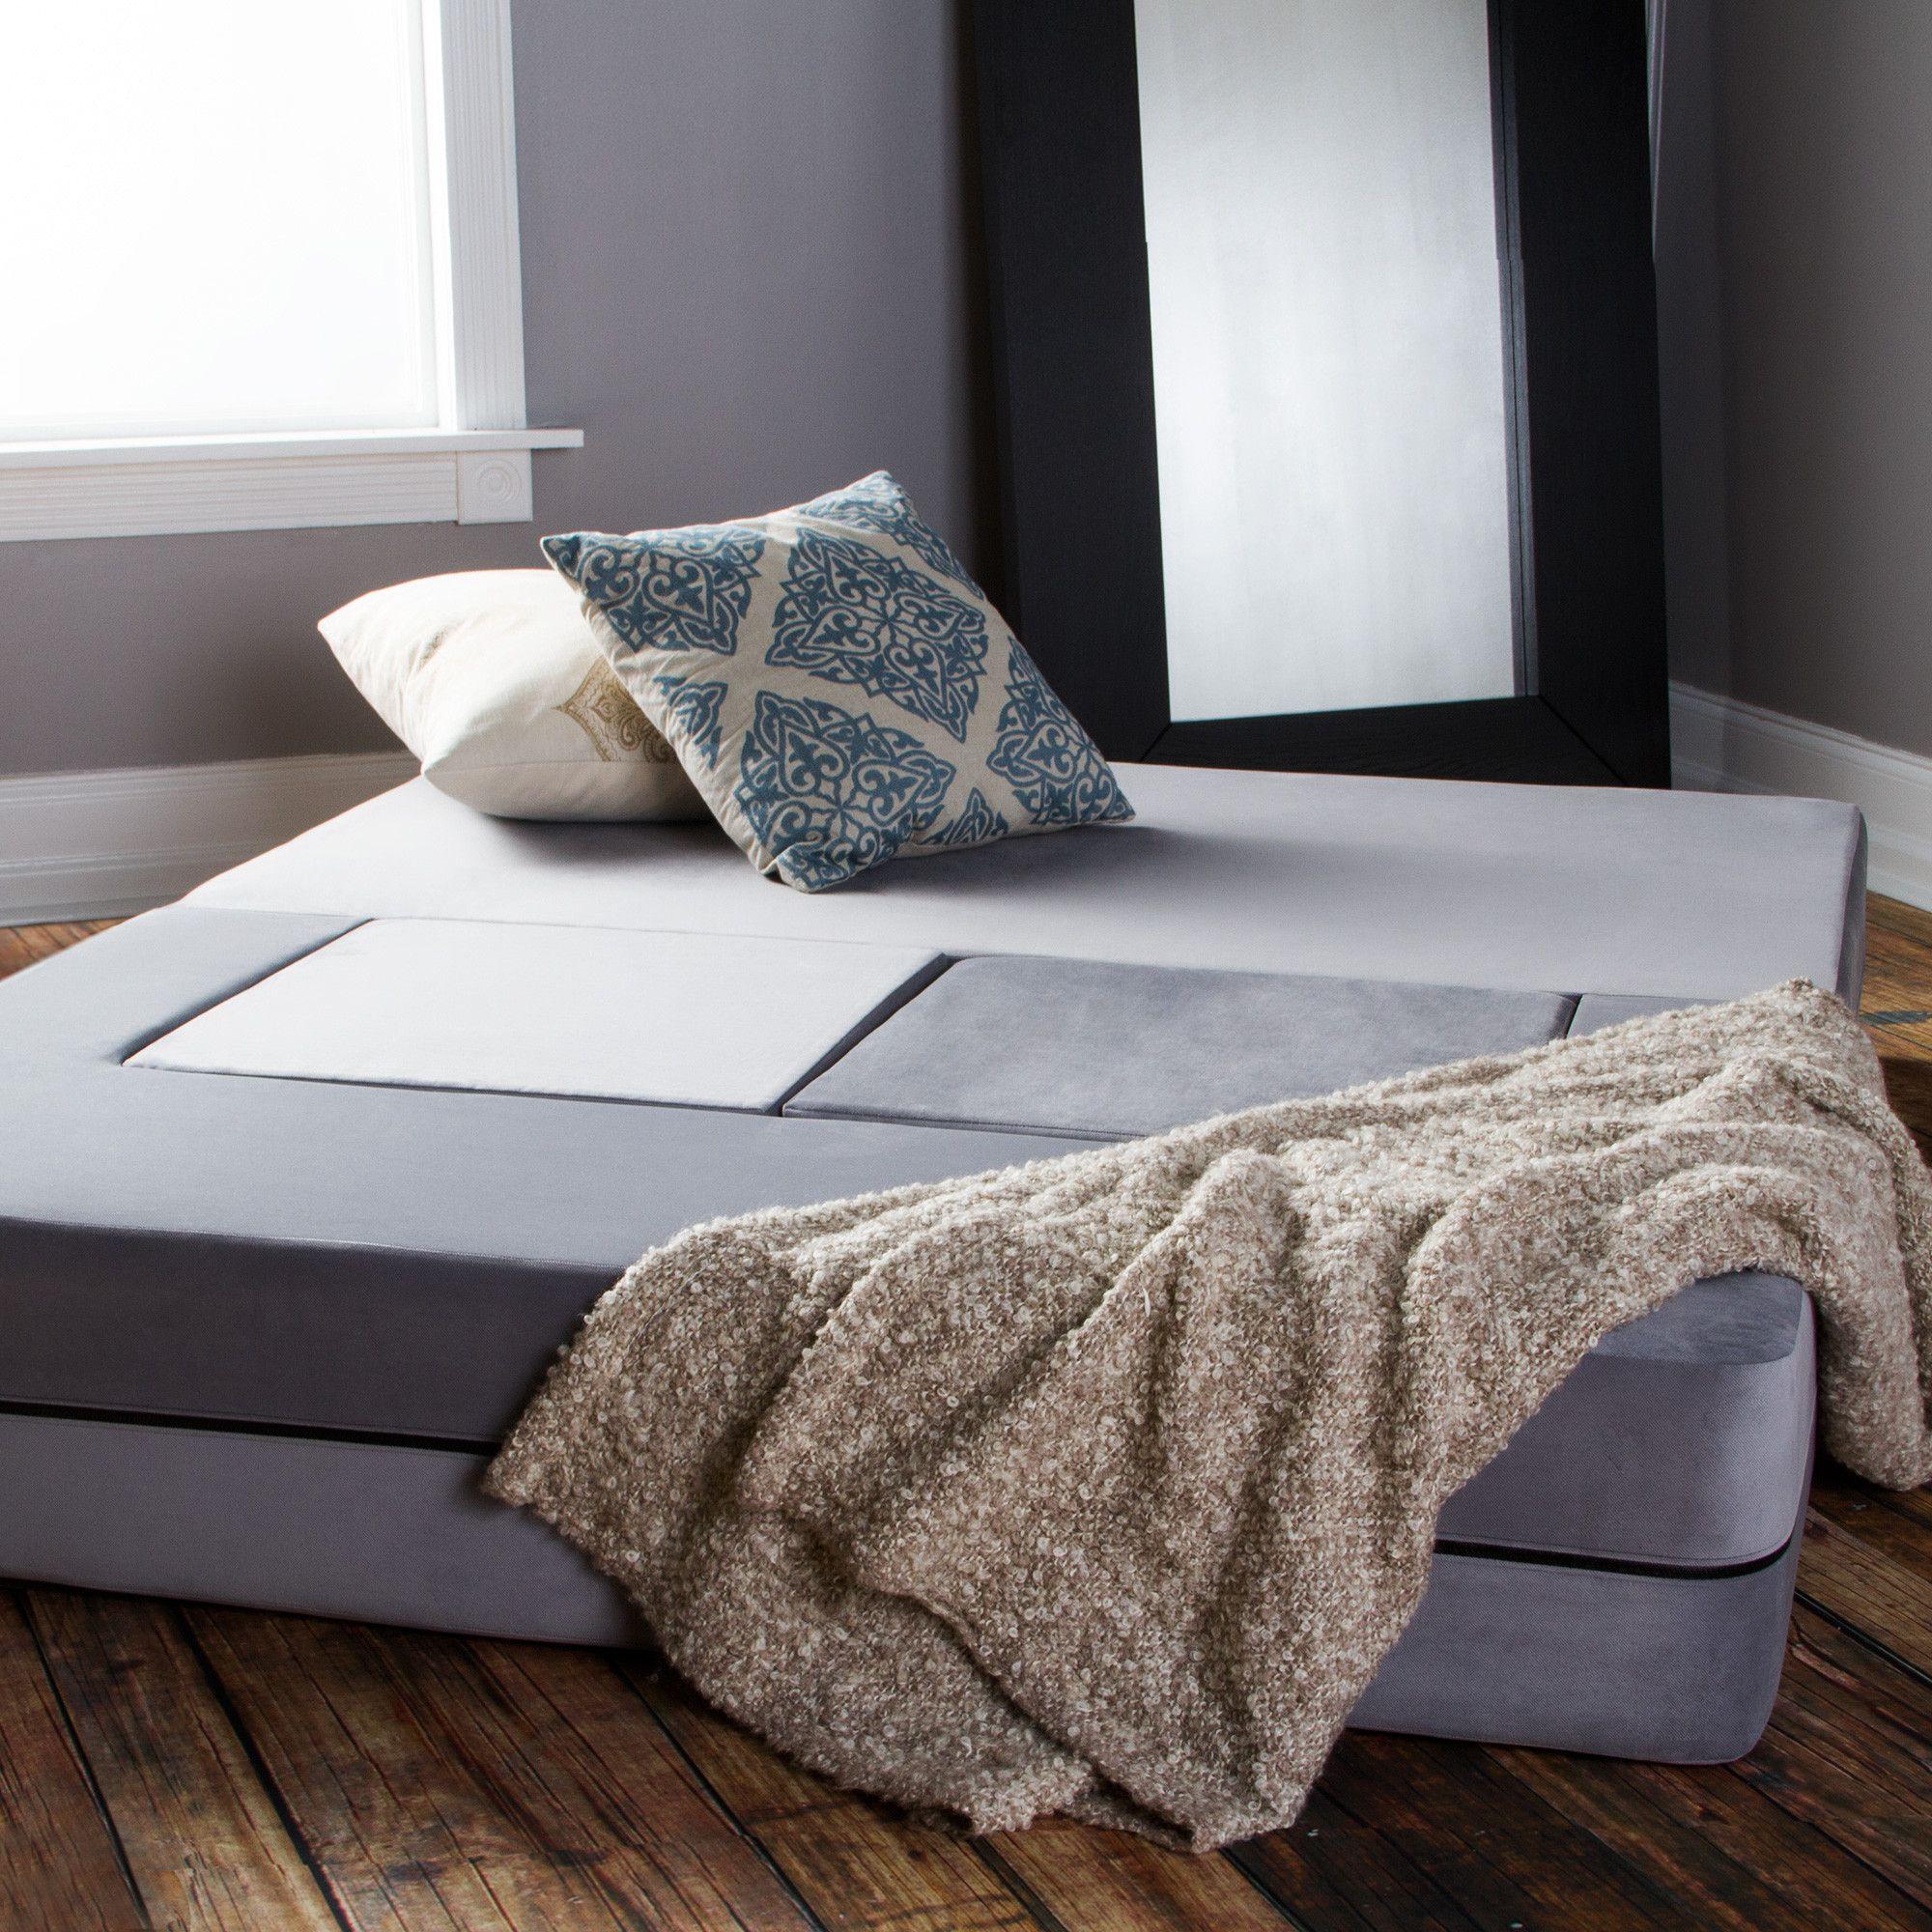 Room Jaxx Zipline Modular Sleeper Loveseat